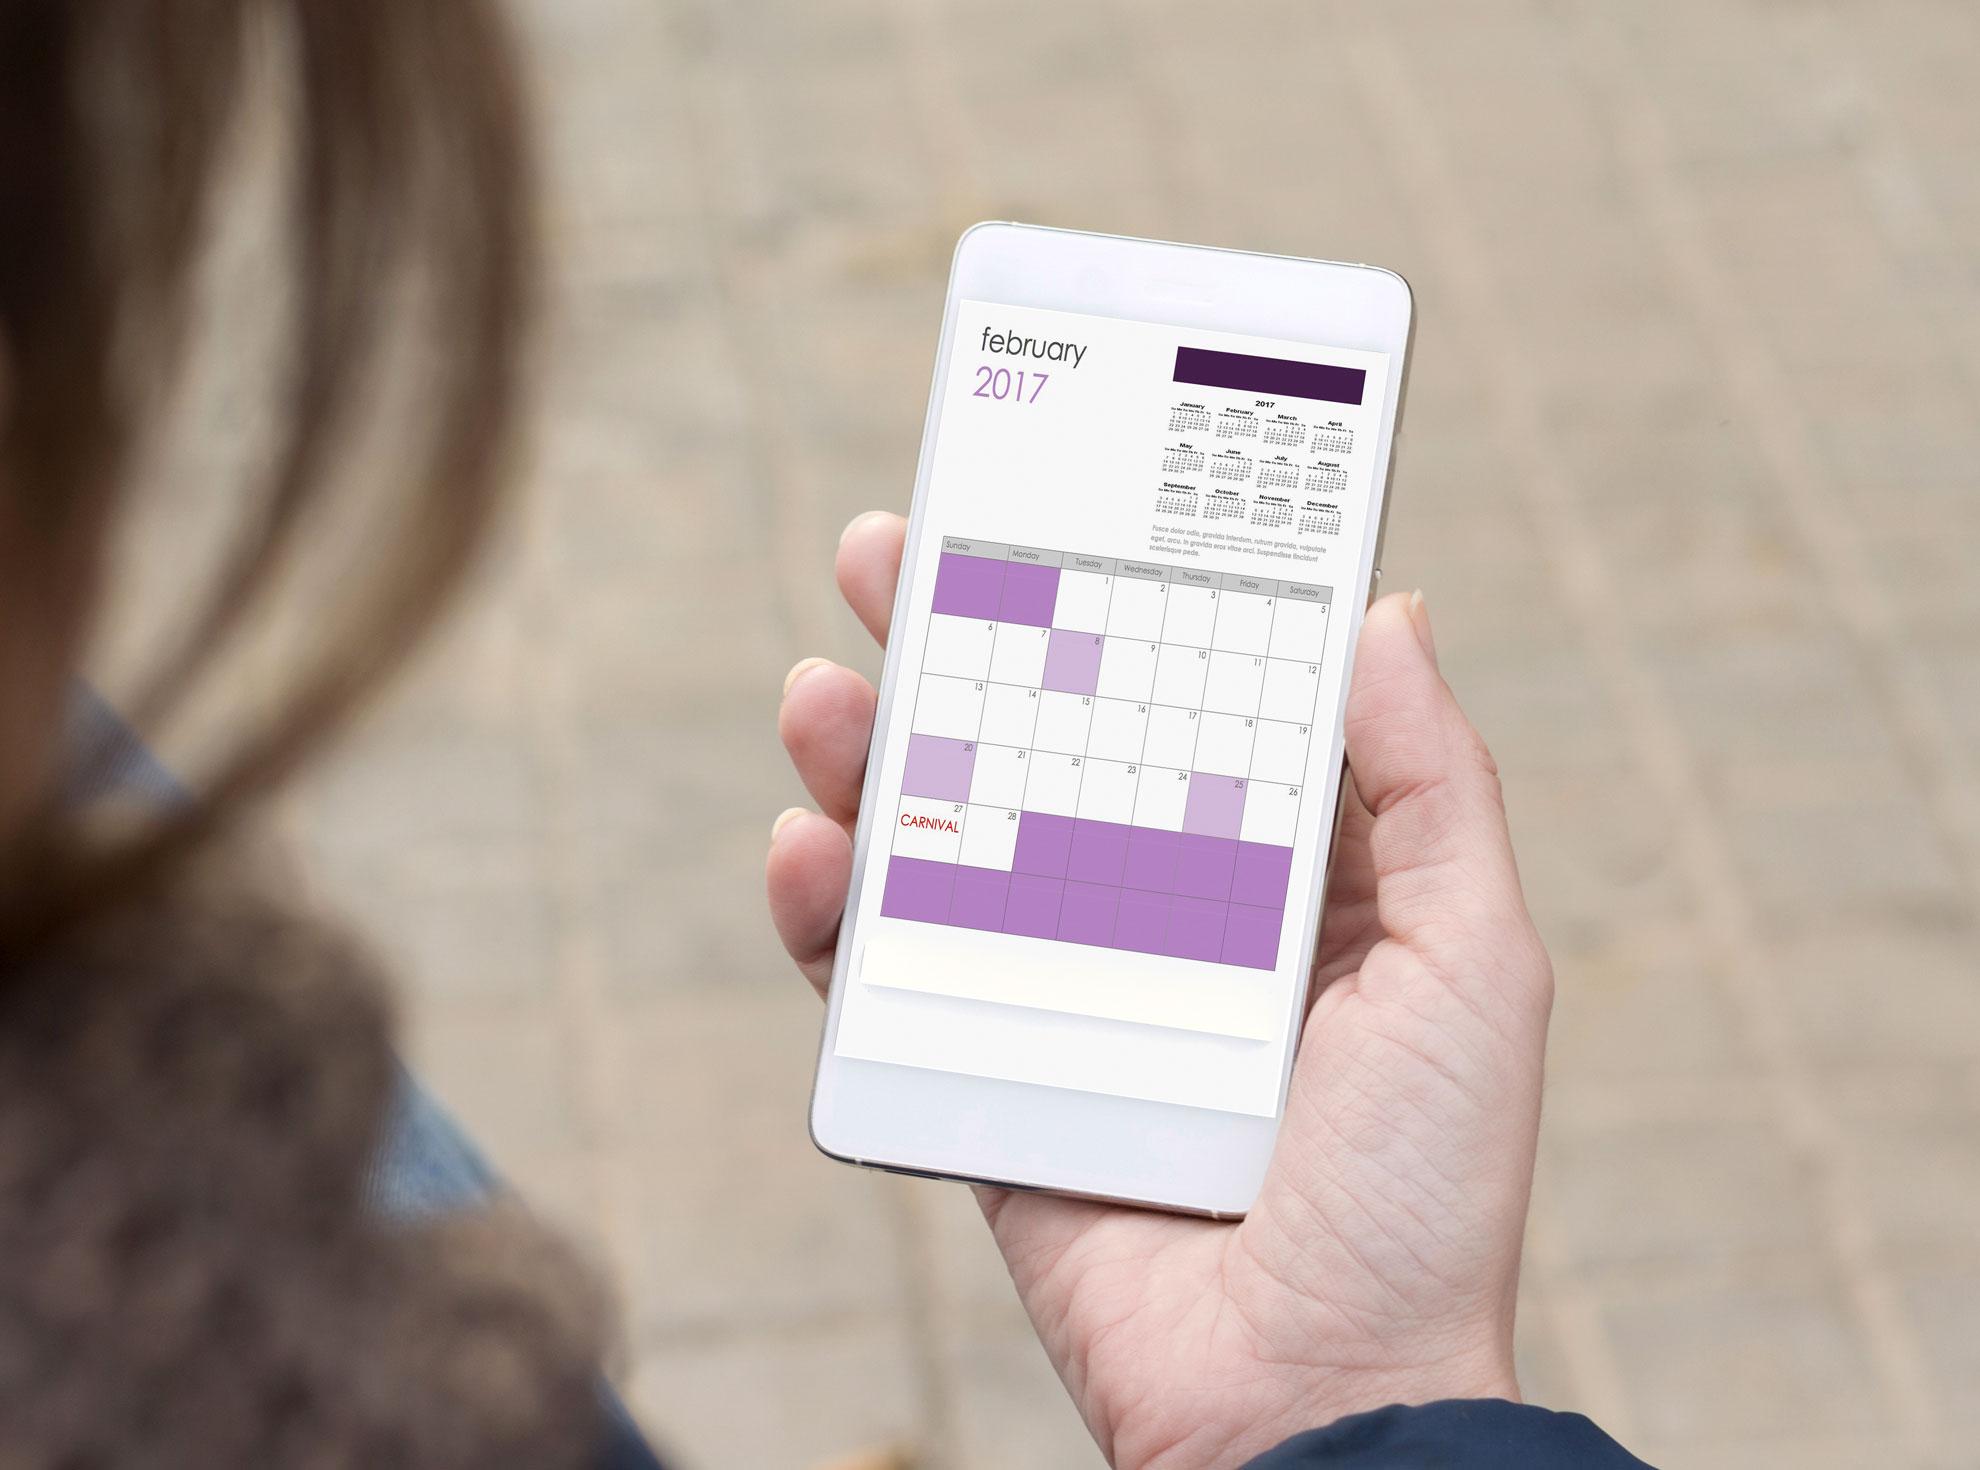 app-gestione-risorse-umane